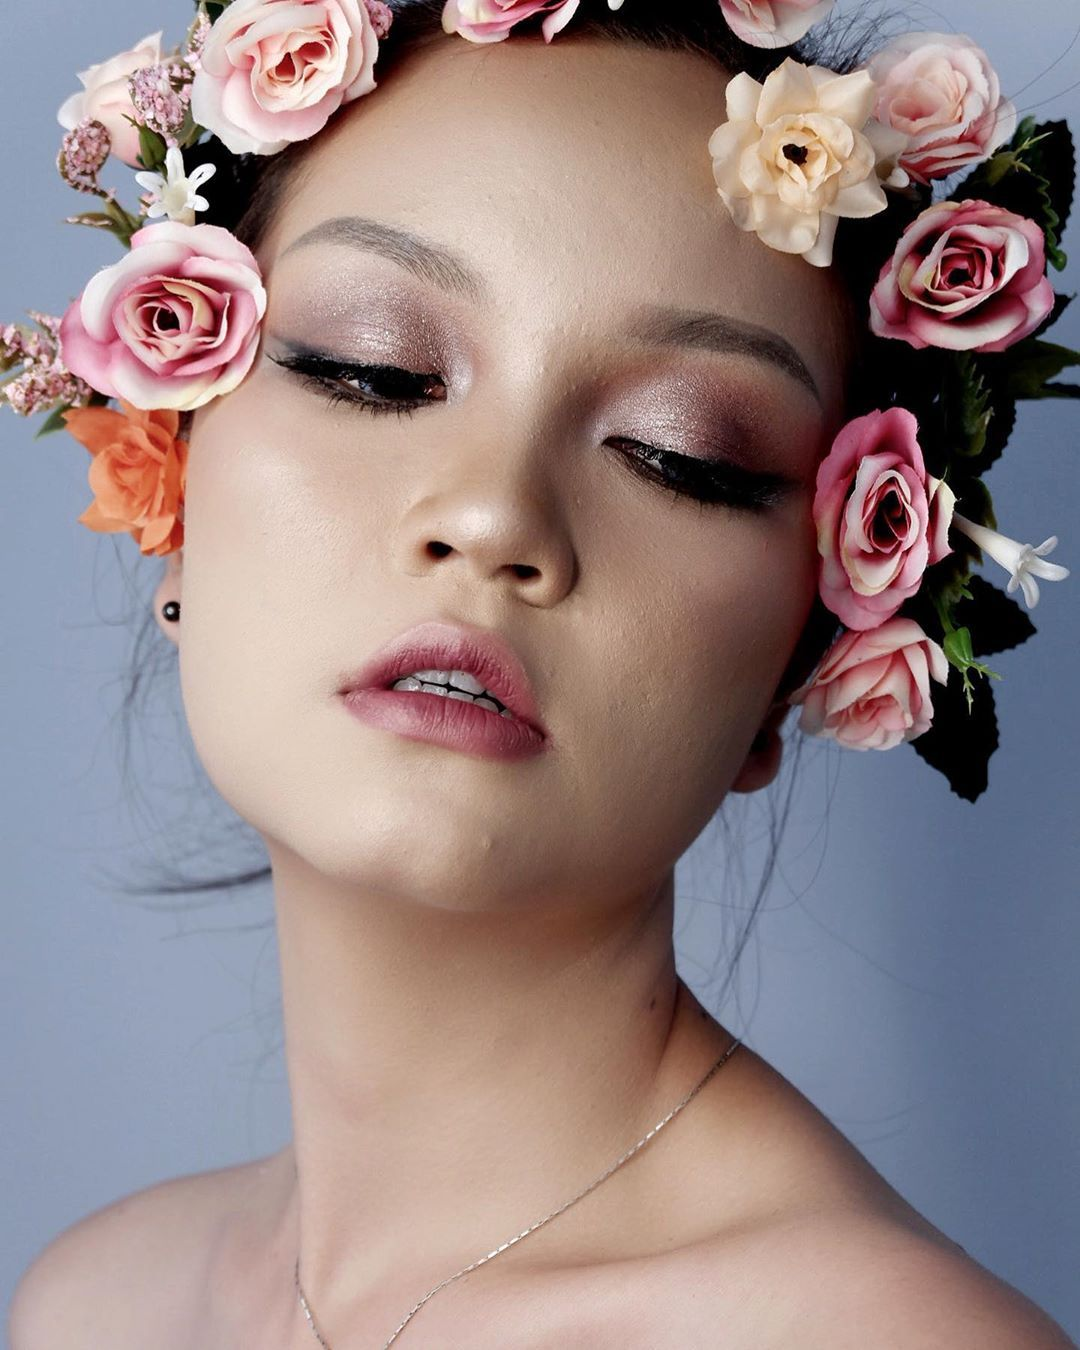 edgy editorial flowers look … #makeup #polishgirl #girl #makeupartist #eyes